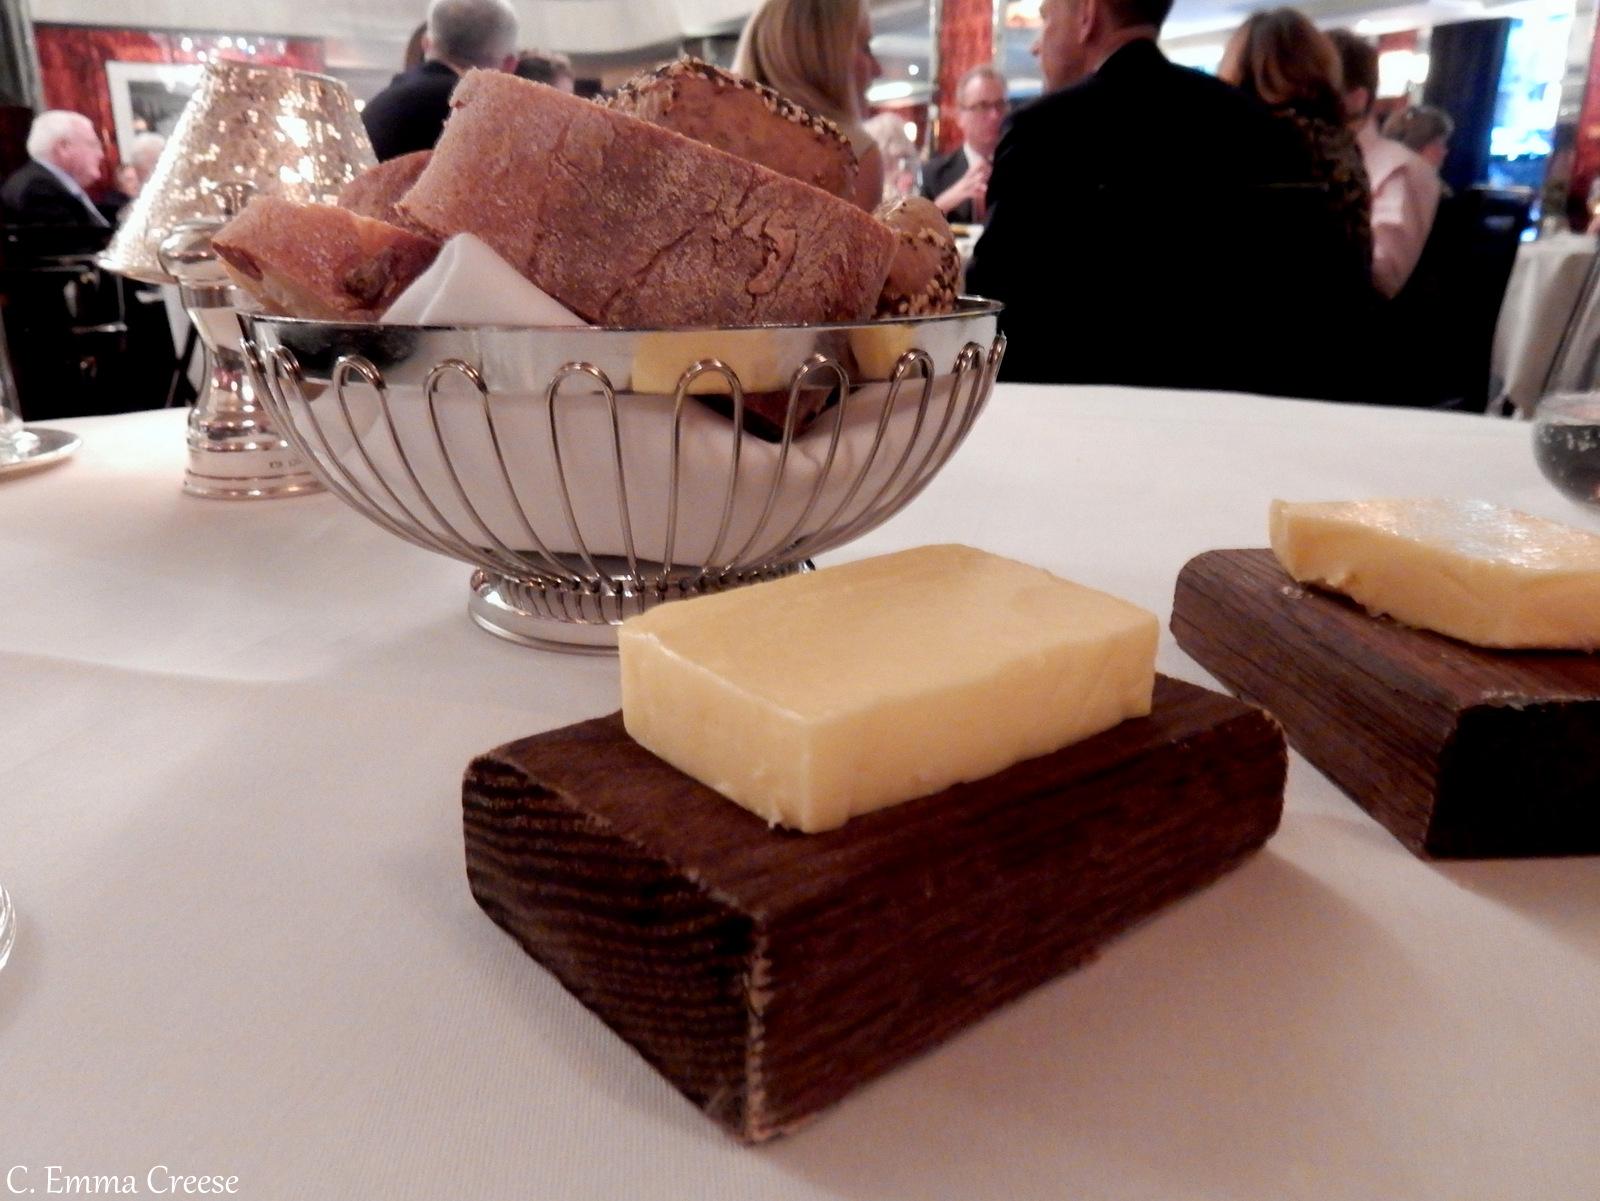 Gordon Ramsay's Savoy Grill - A birthday lunch